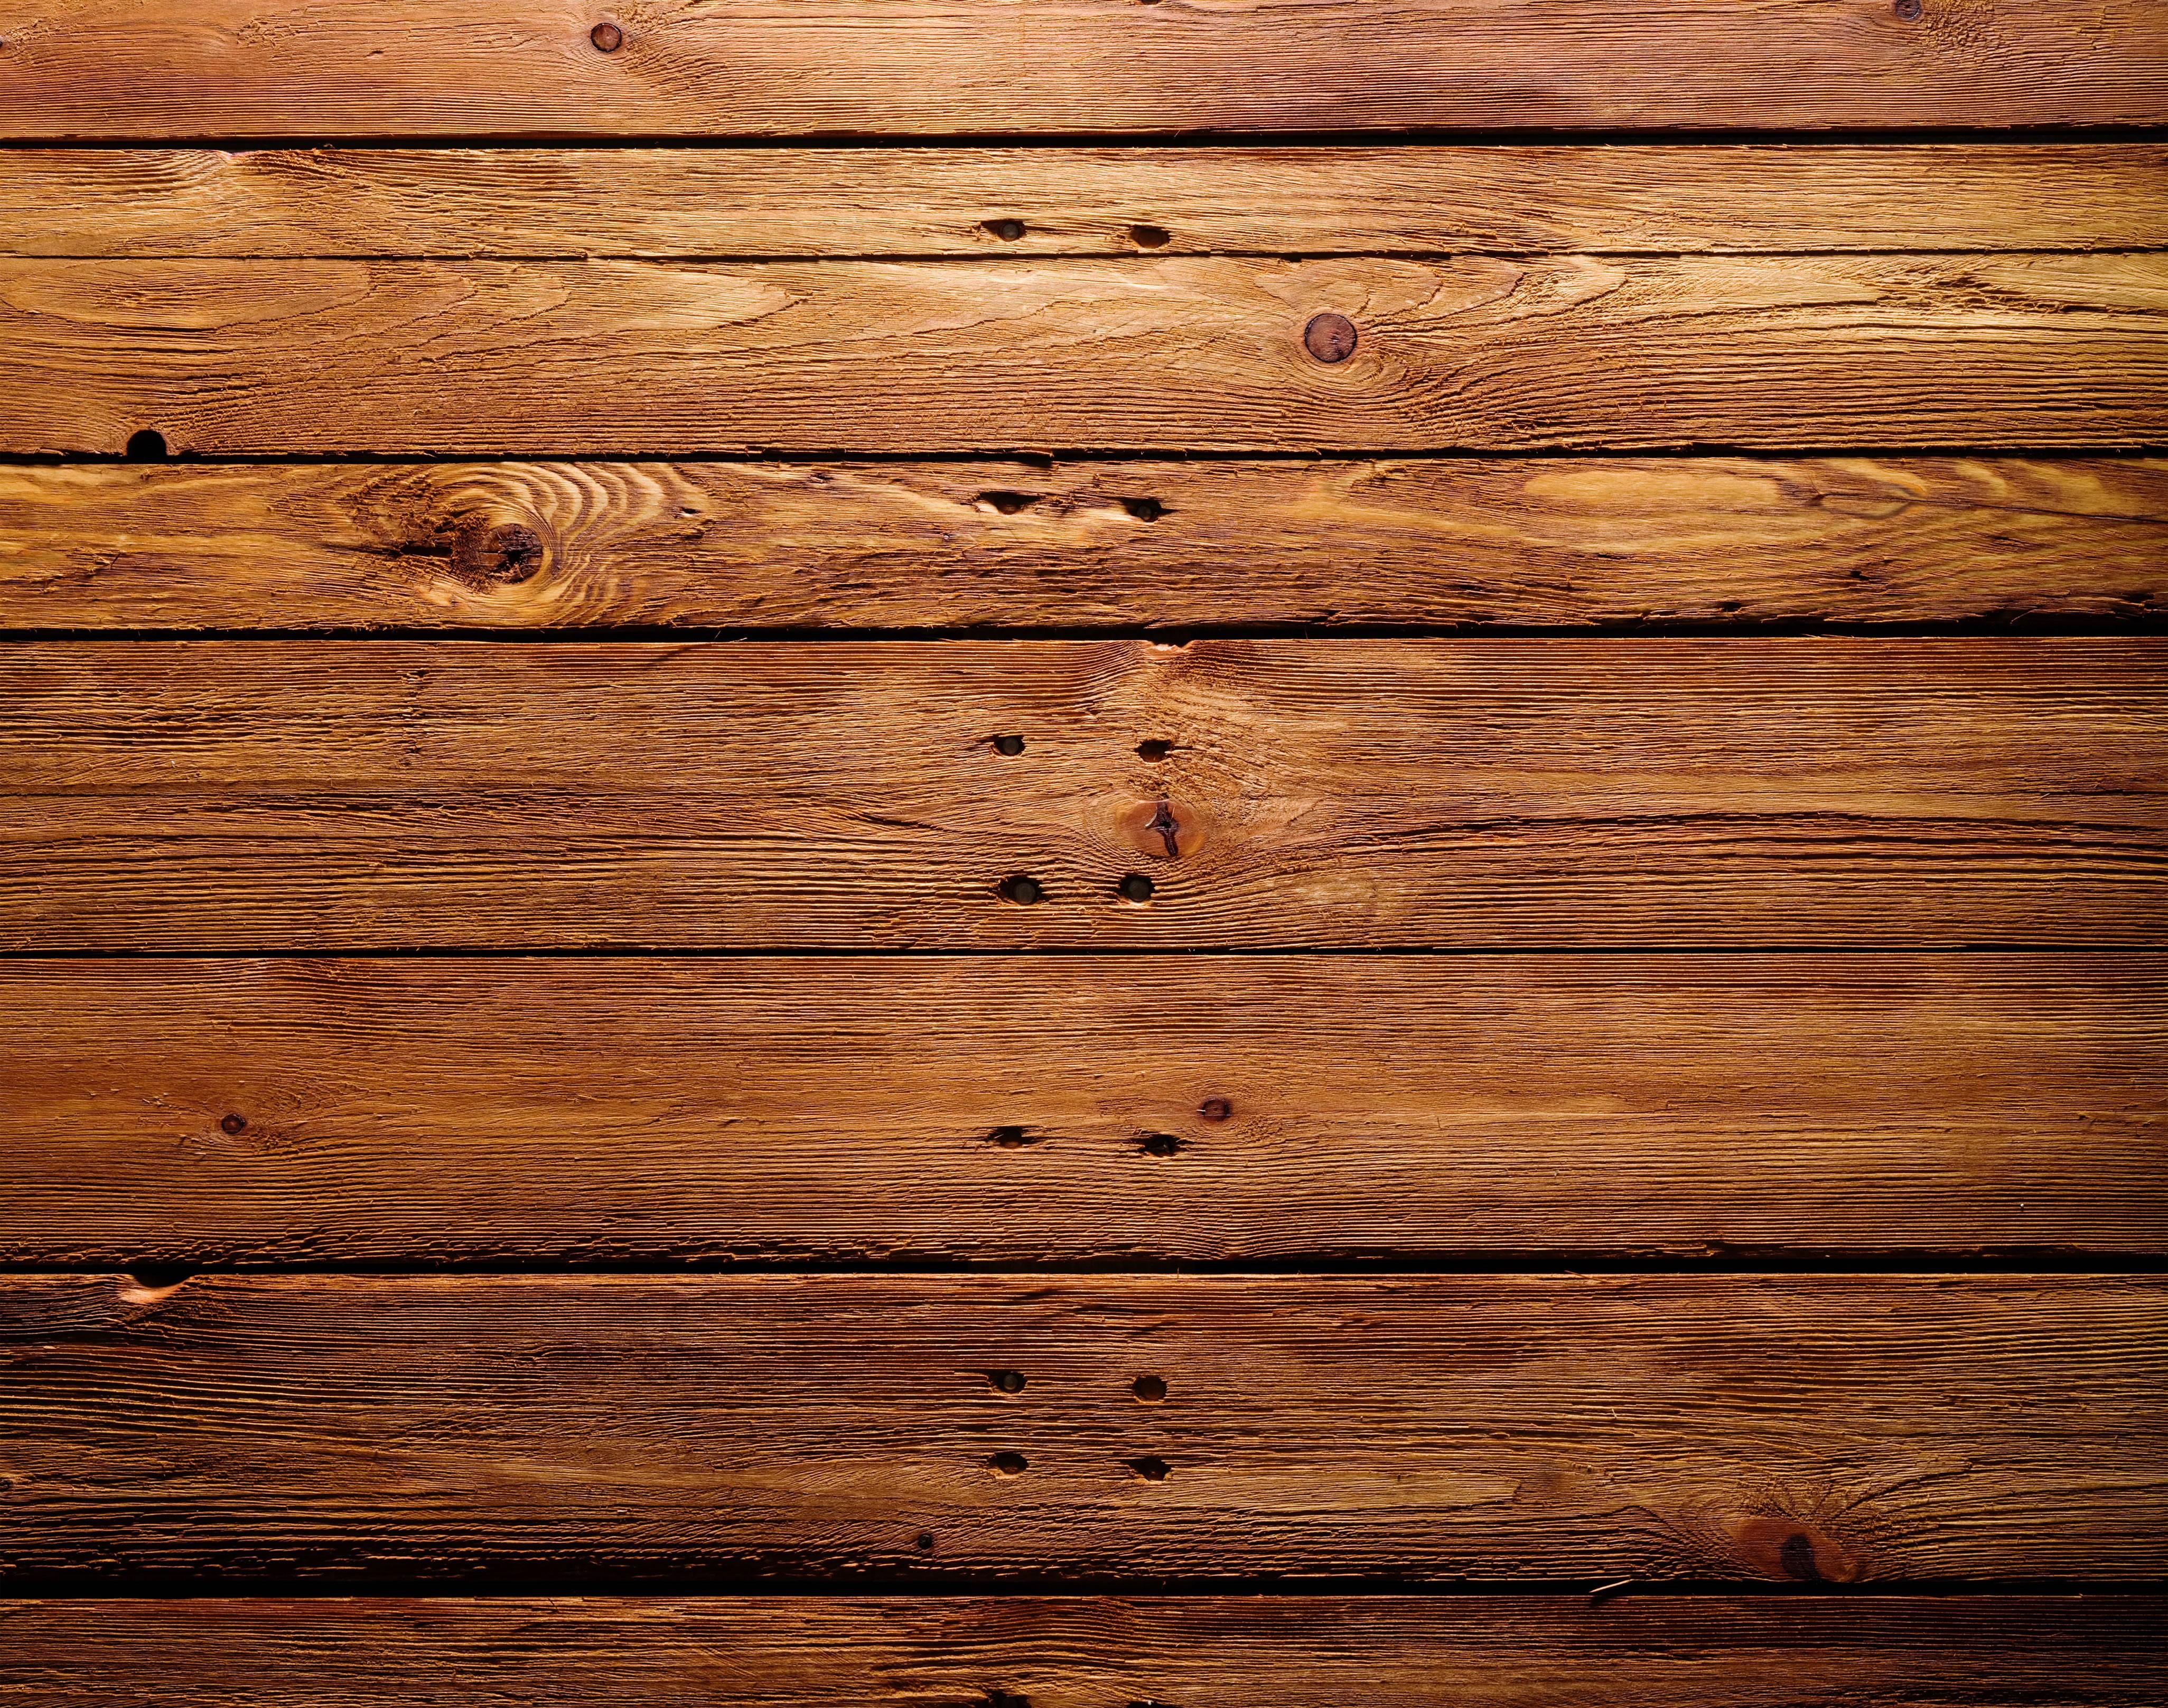 holz nahansicht textur bauholz stock hartholz bodenbelag holzboden holzbeize laminatboden mann machte objekt holz planke - Hartholz Oder Laminatboden